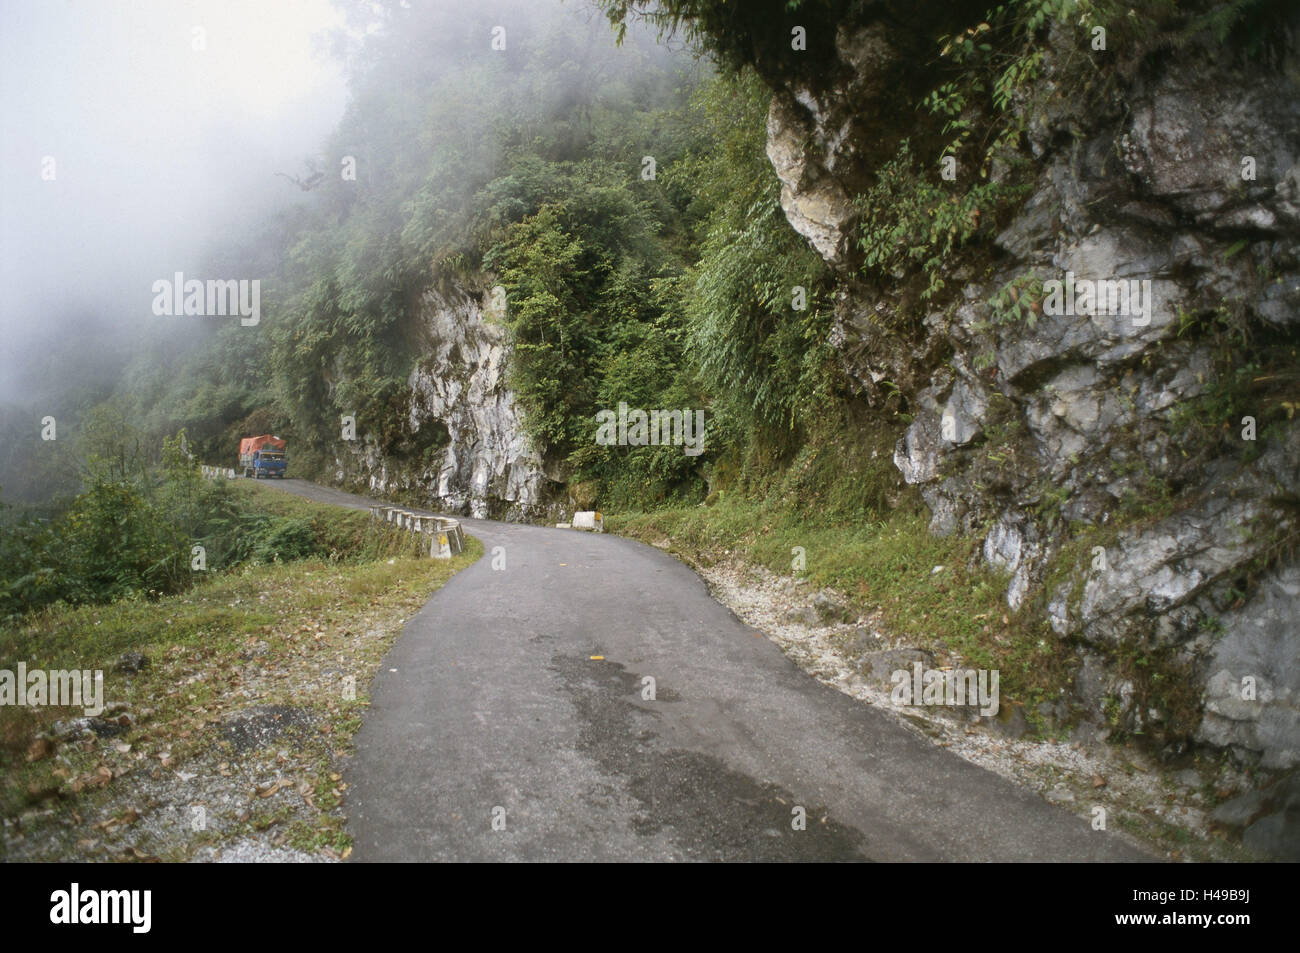 Bhutan, to the east Bumthang, highland, mountain road, truck, fog, Asia, the Himalayas, kingdom, Ostbhutan, traffic - Stock Image